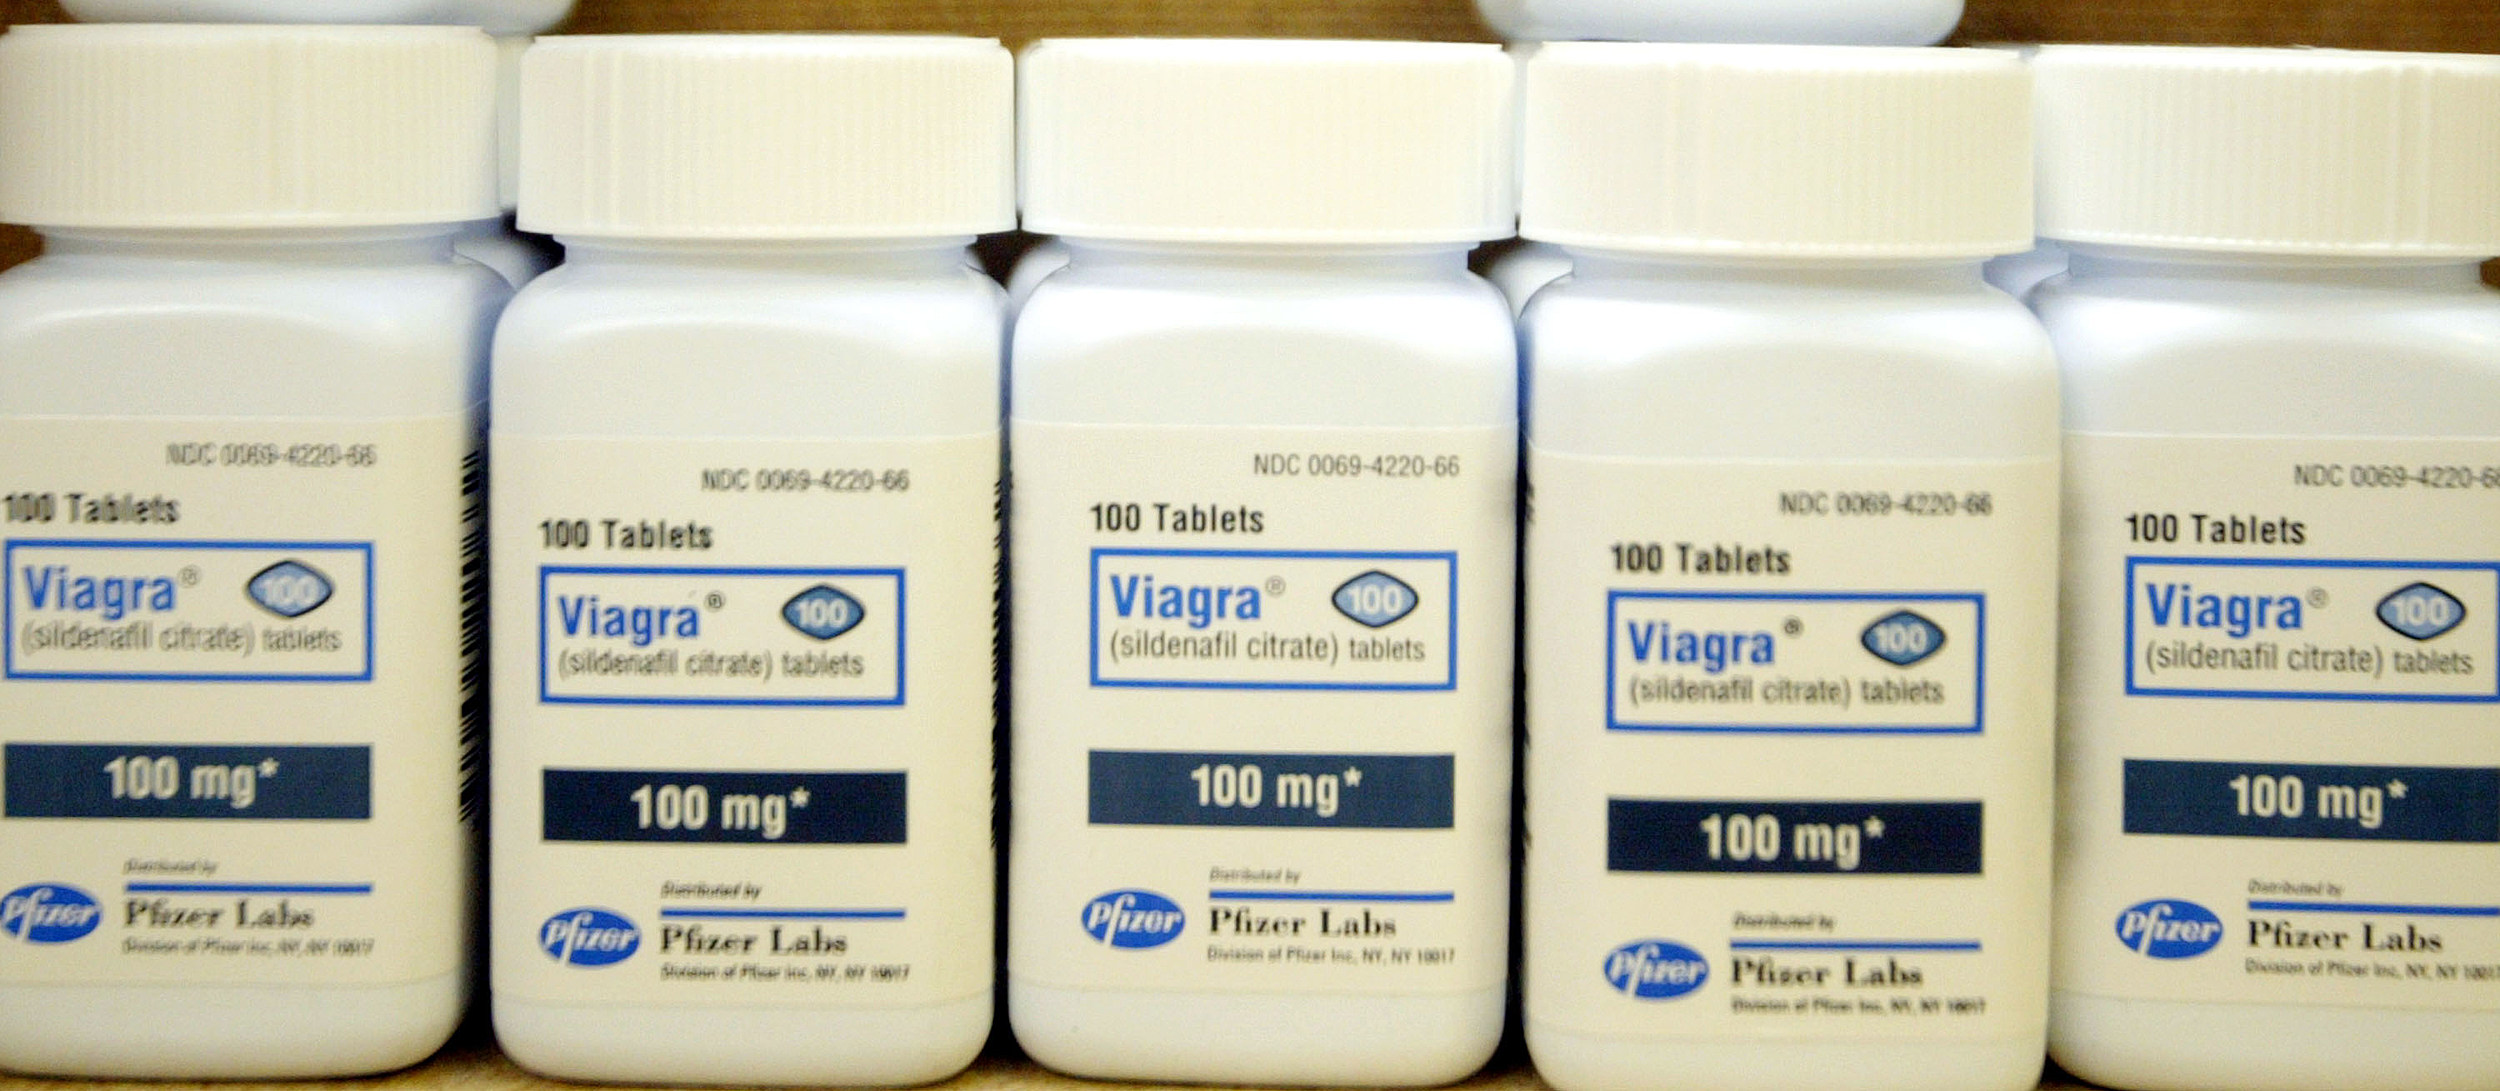 Discount Herbal Viagra Viagra Viagra Viagra